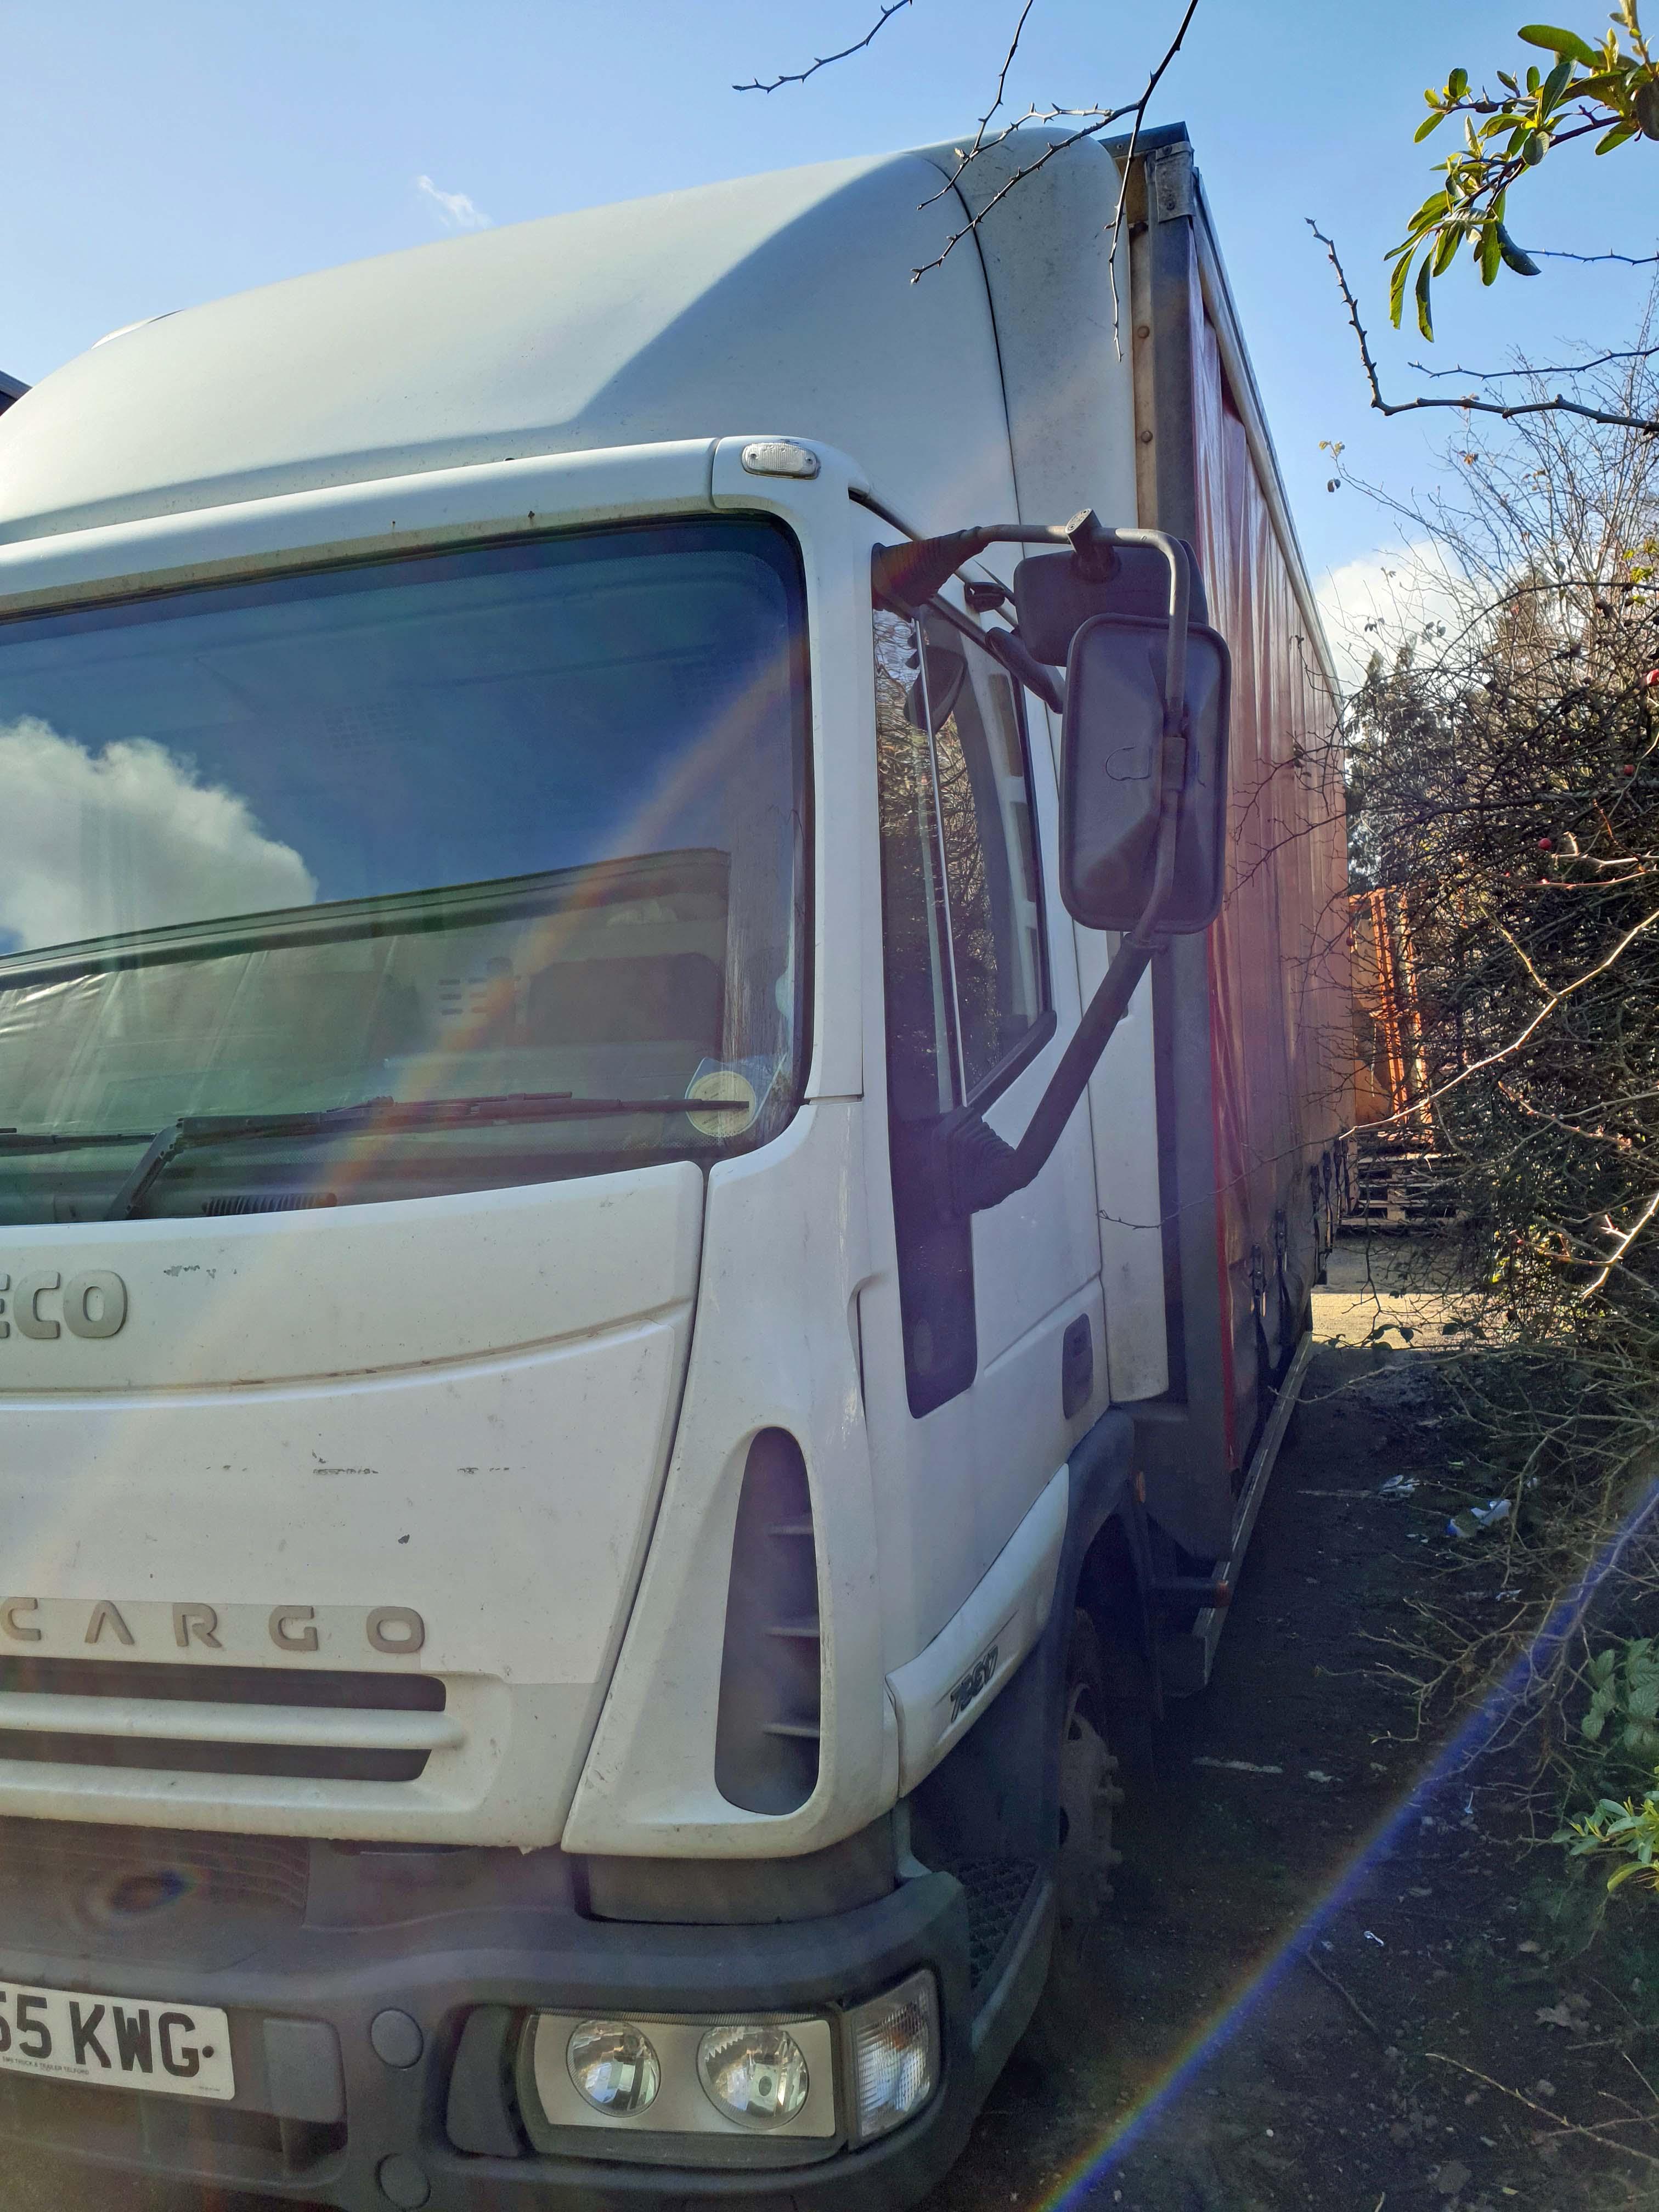 An IVECO Eurocargo ML 75 E17 3920cc 4x2 7.5-Tonne Curtainside Truck, Registration No. FJ55 KWG, - Image 2 of 5